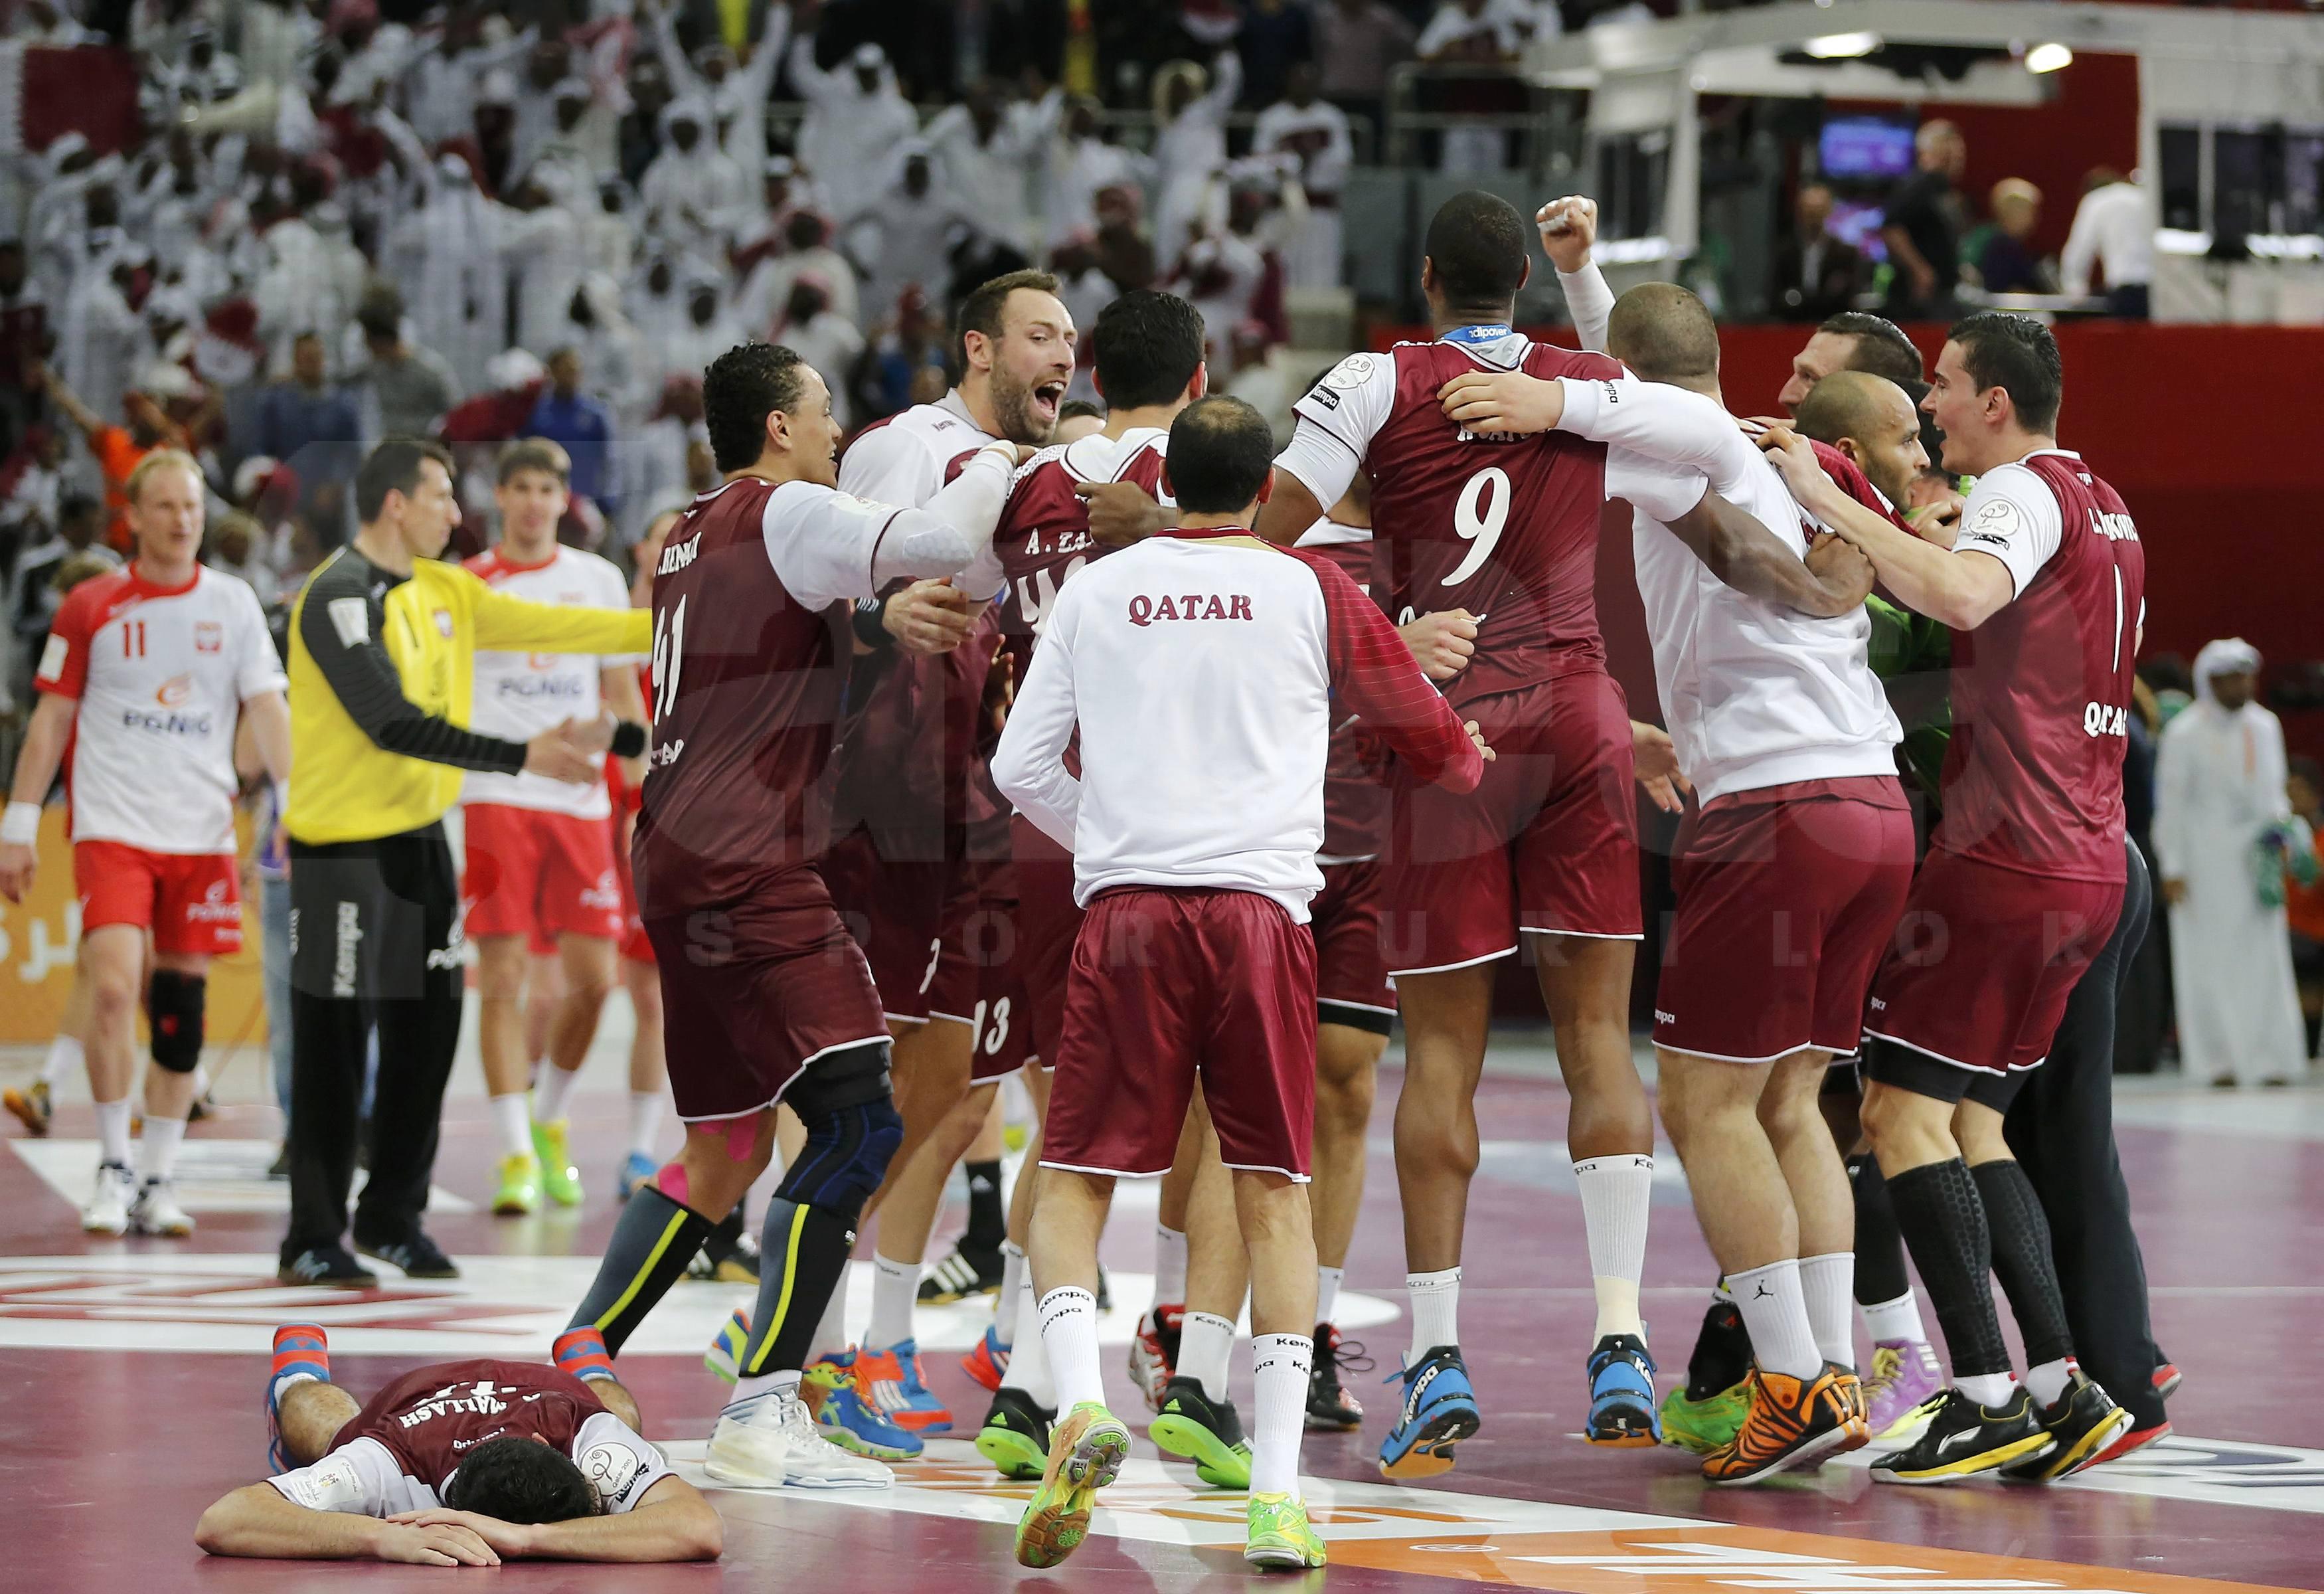 Performanta incredibila reusita de nationala de handbal masculin a Qatarului! A eliminat Polonia si a devenit prima finalista non-europeana din istoria Campionatului Mondial